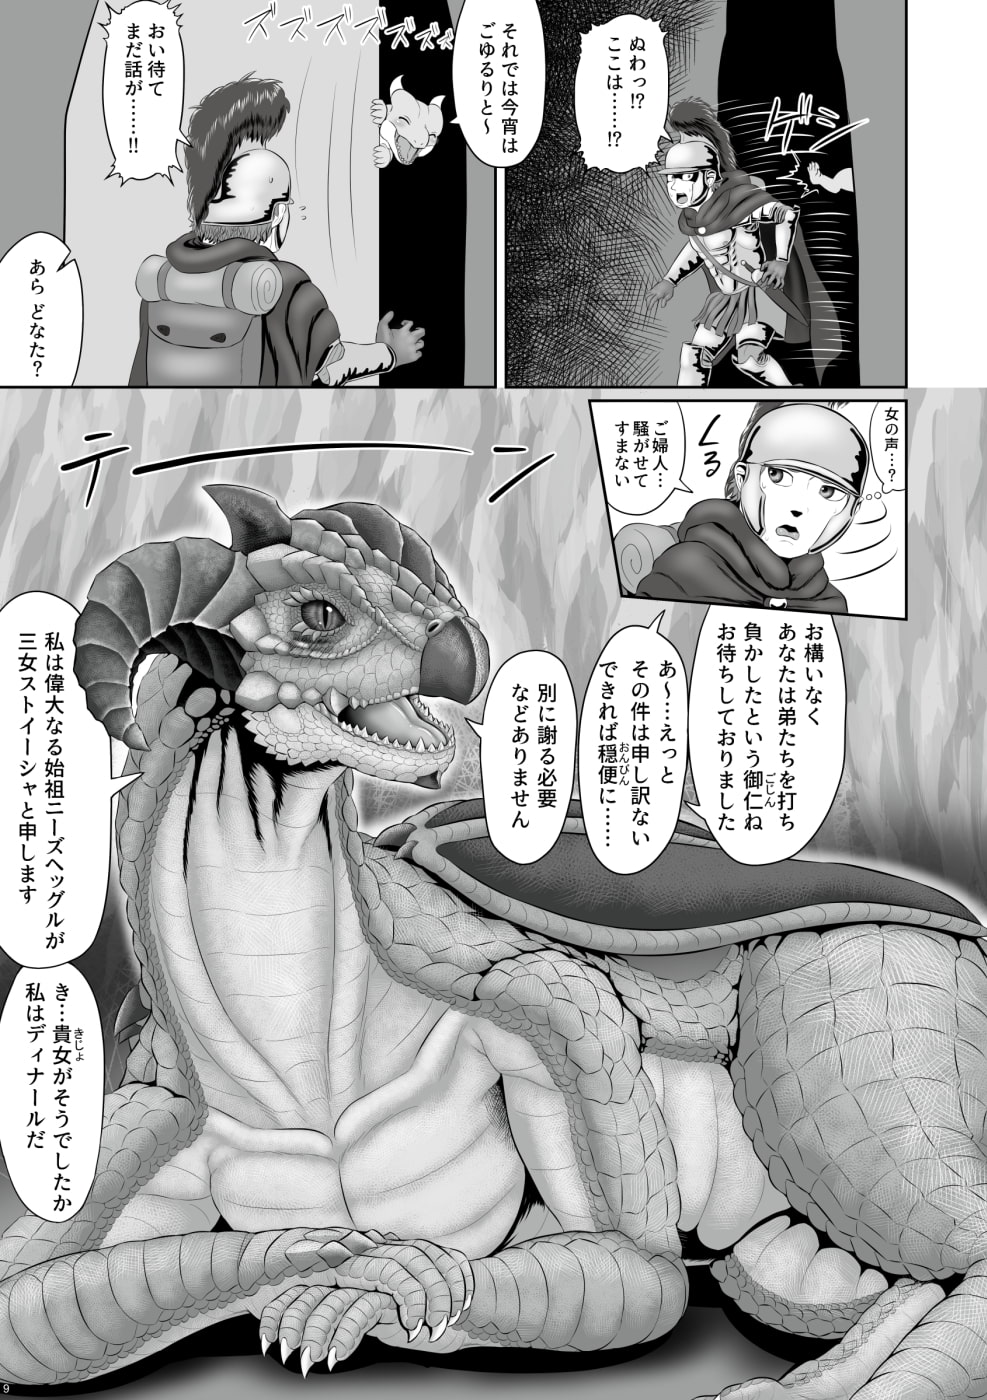 蛮王記 〜龍神姫伝、竜魔王伝二章、鰐侍中伝一気読みセット〜